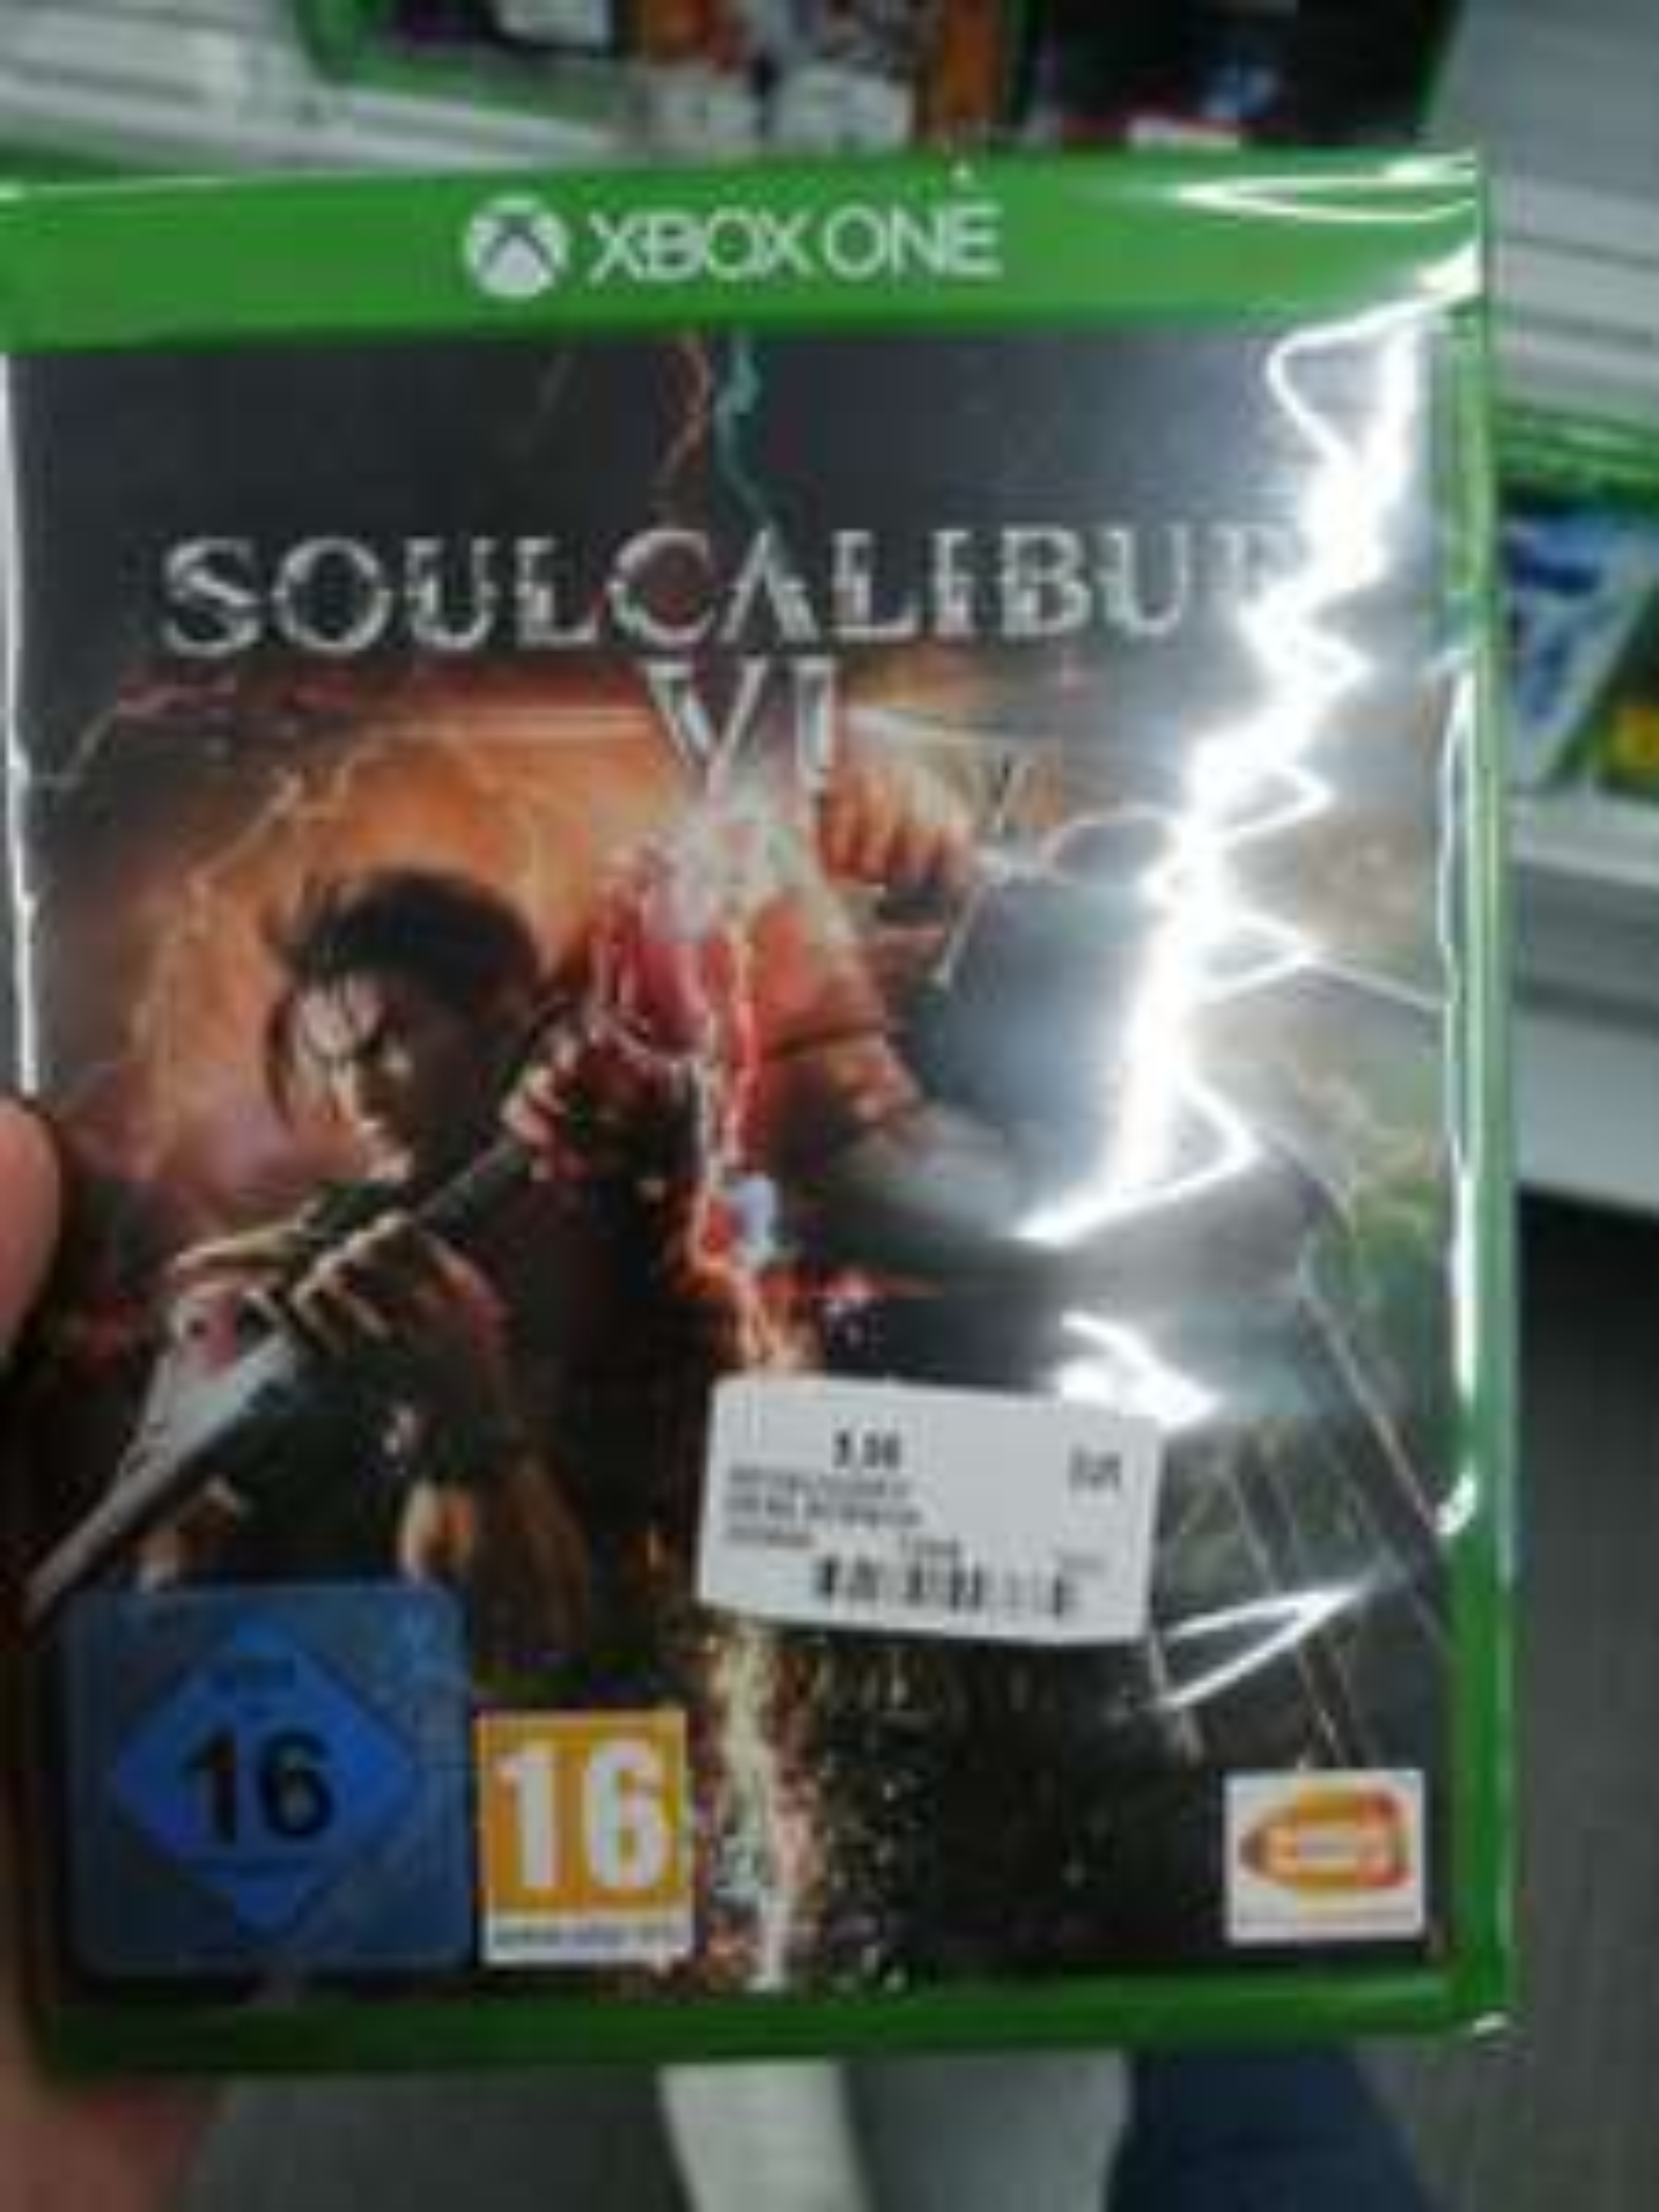 [Lokal Mediamarkt Rheine] SoulCalibur VI & Tales of VesperiaDefinitive Edition (Xbox One) für je 9,99€